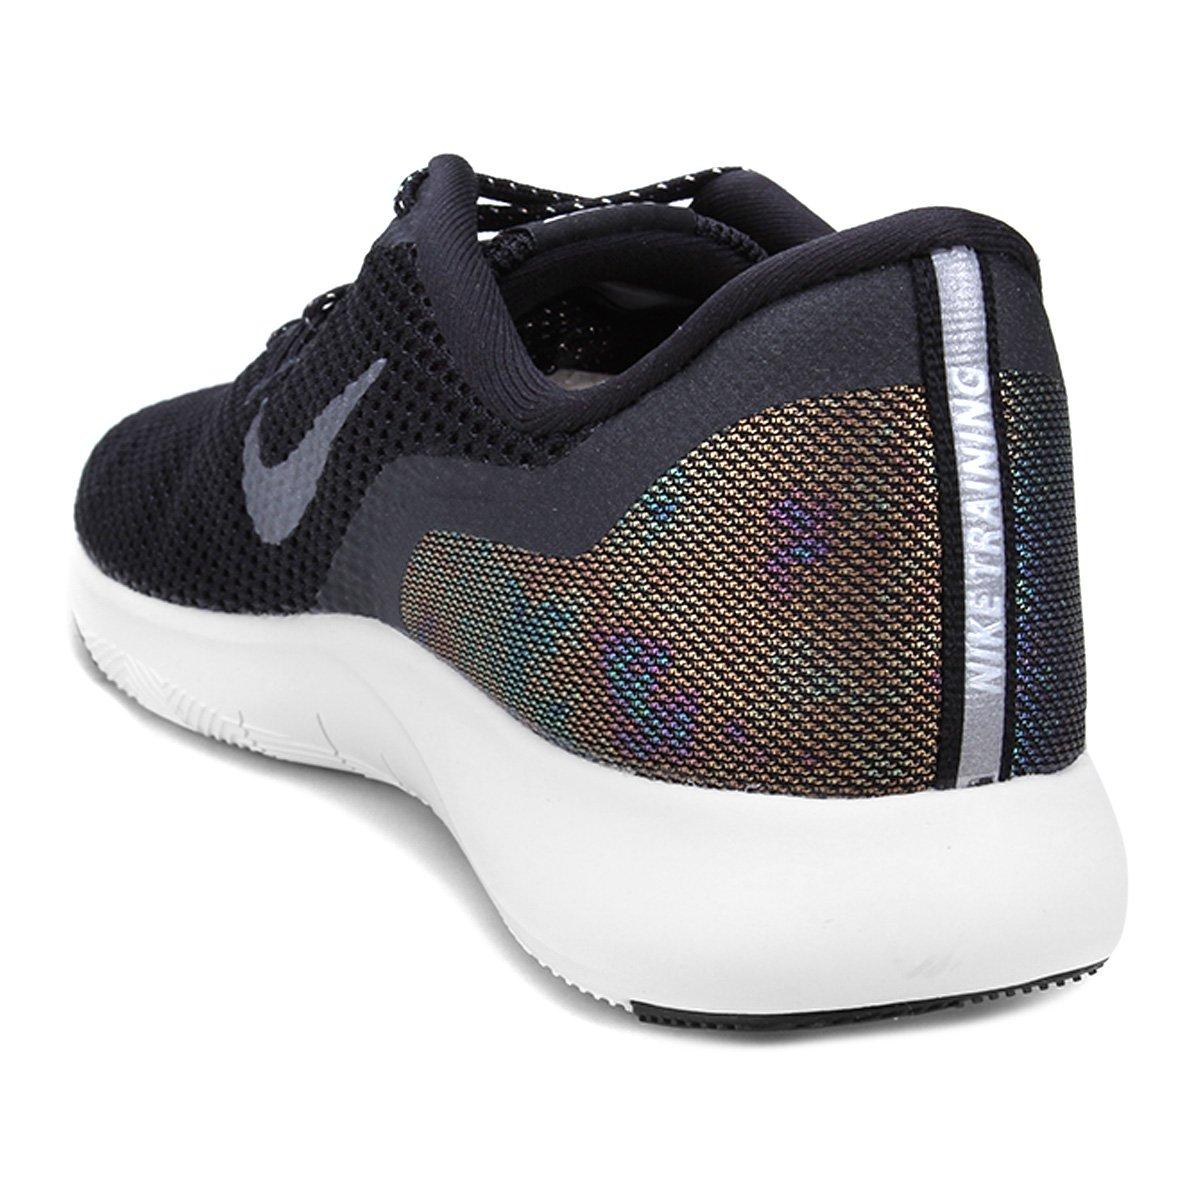 Tênis Nike Flex Trainer 7 Mtlc Feminino - Preto e Cinza